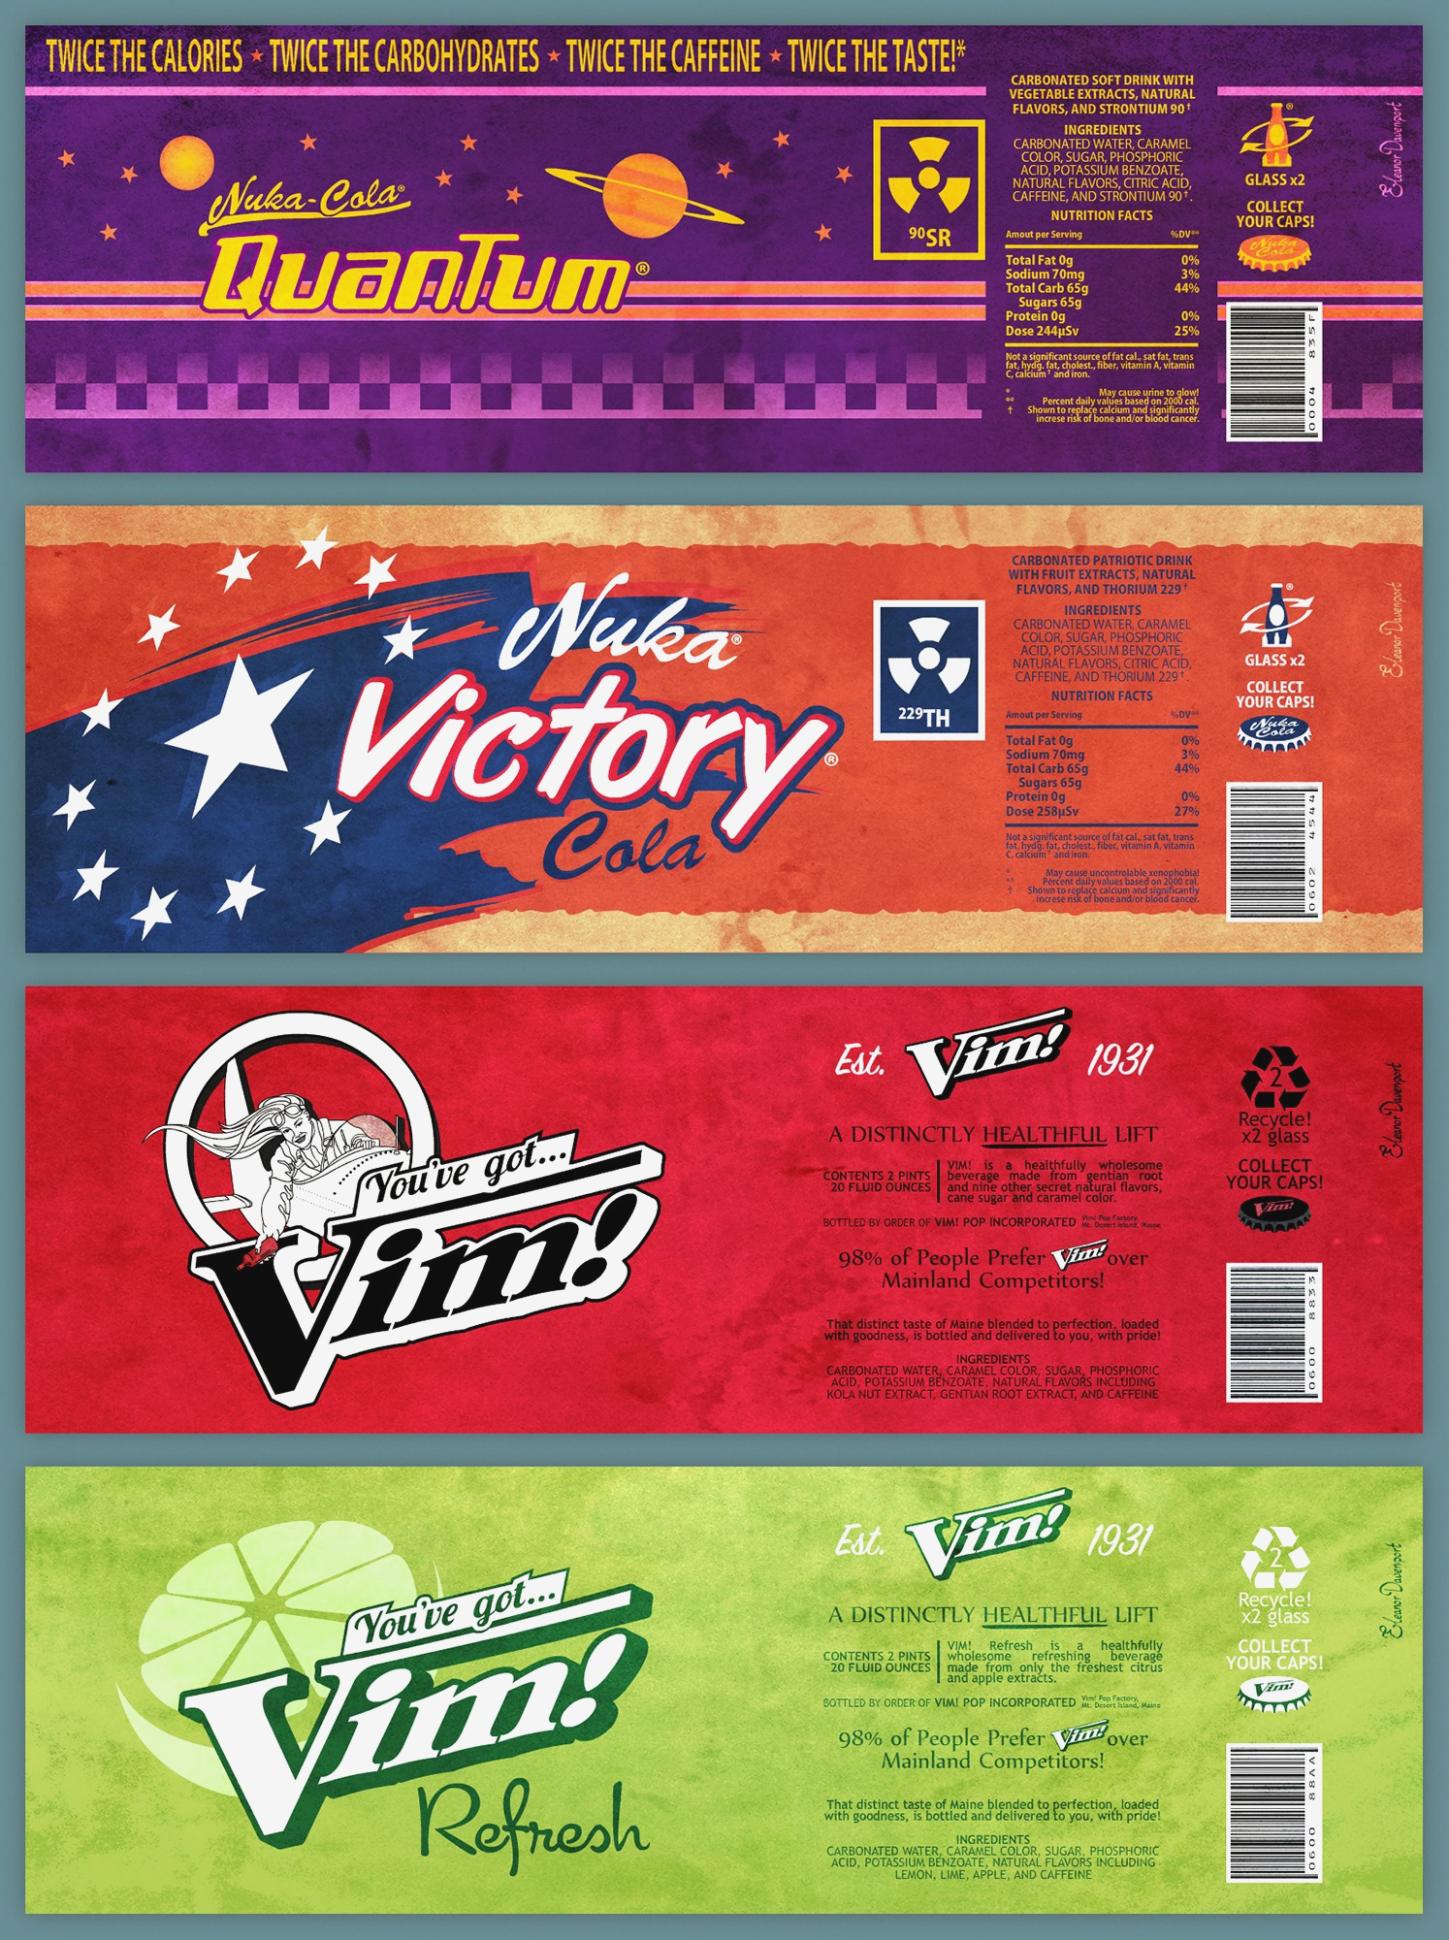 Free Printable Soda Vending Machine Labels Fallout Soda Labels I Got - Free Printable Soda Vending Machine Labels